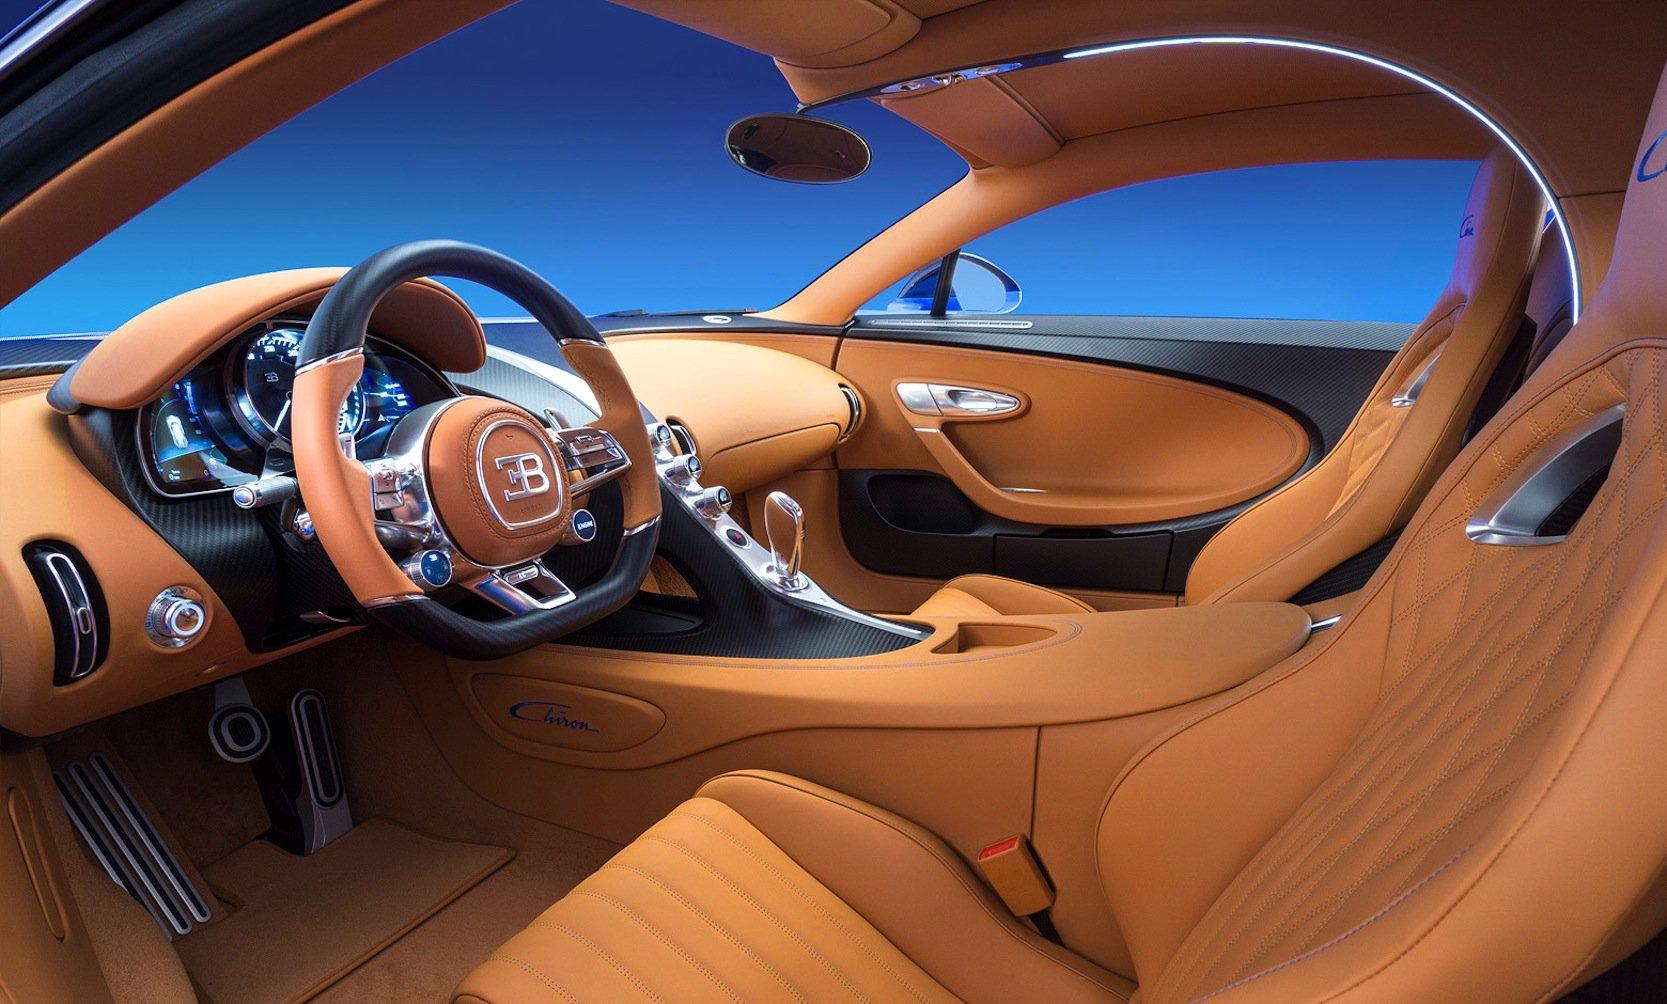 Luxus pur: Innenraum des Bugatti Chiron.